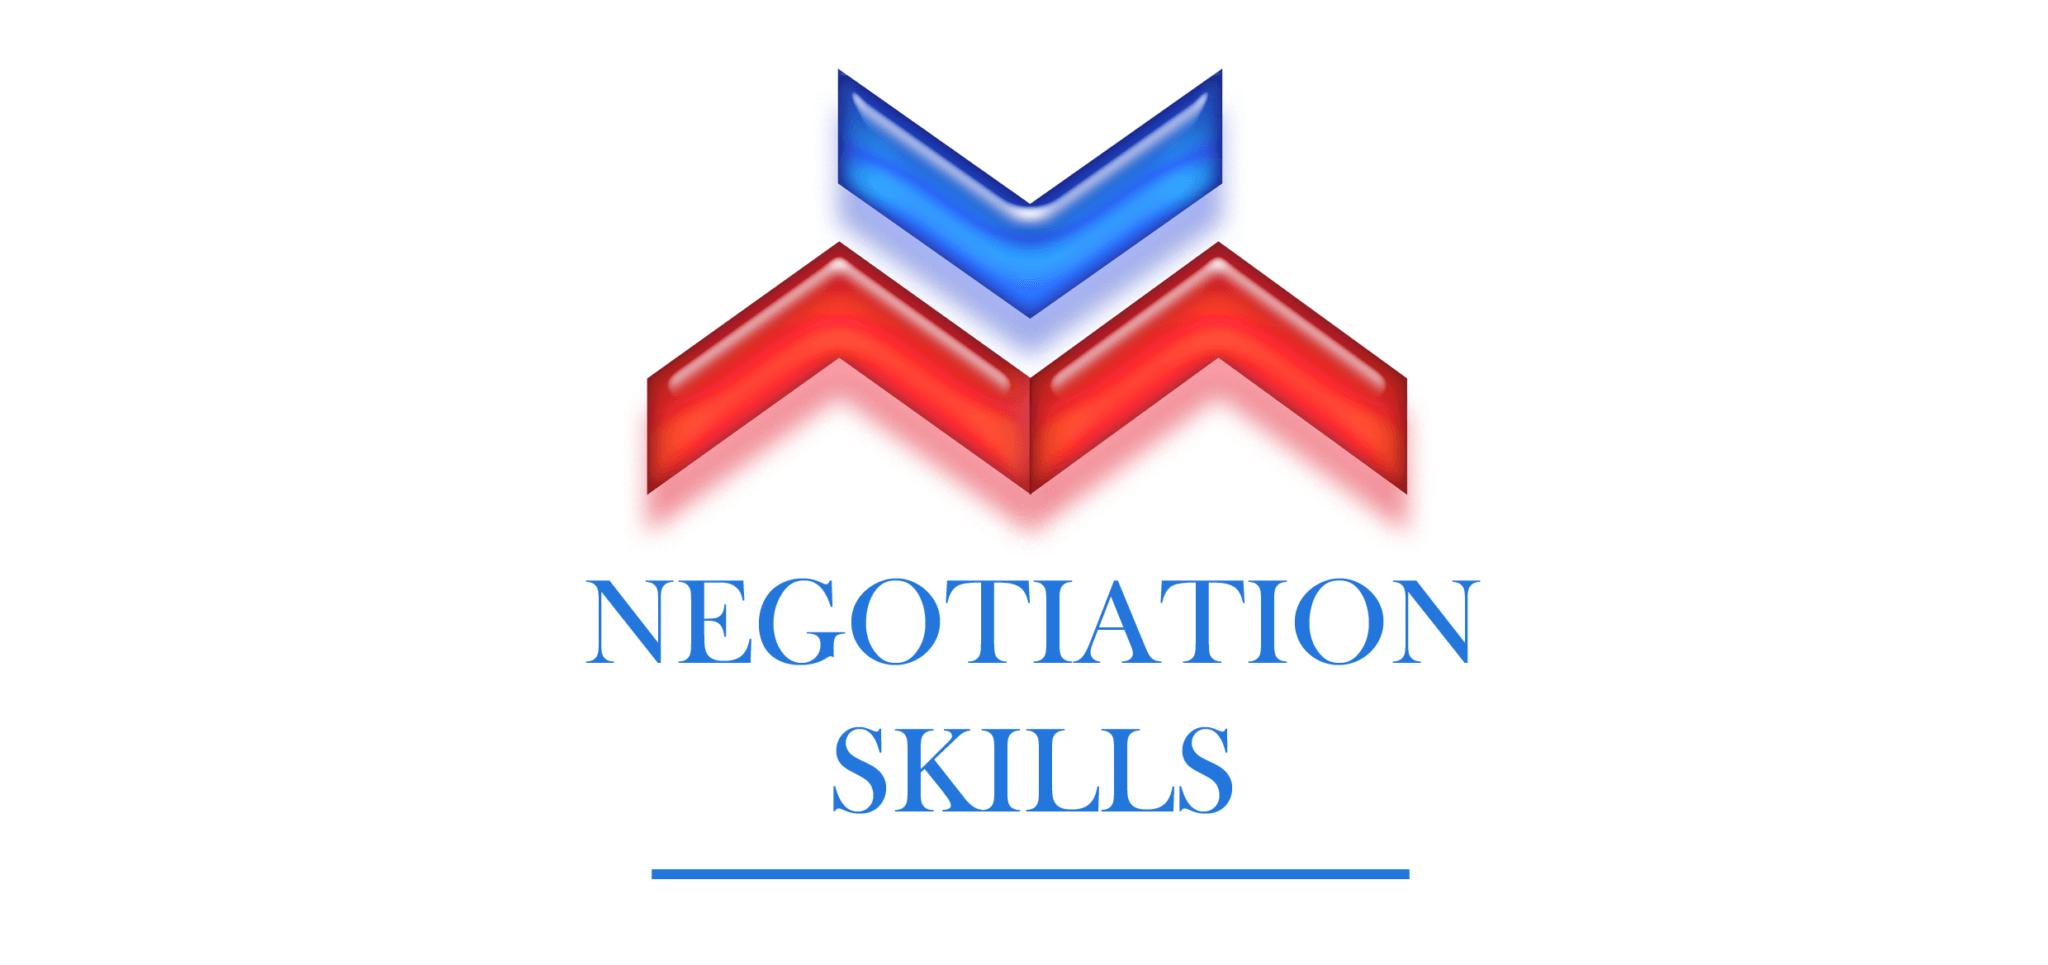 Negotiation Skills from Matrix Development